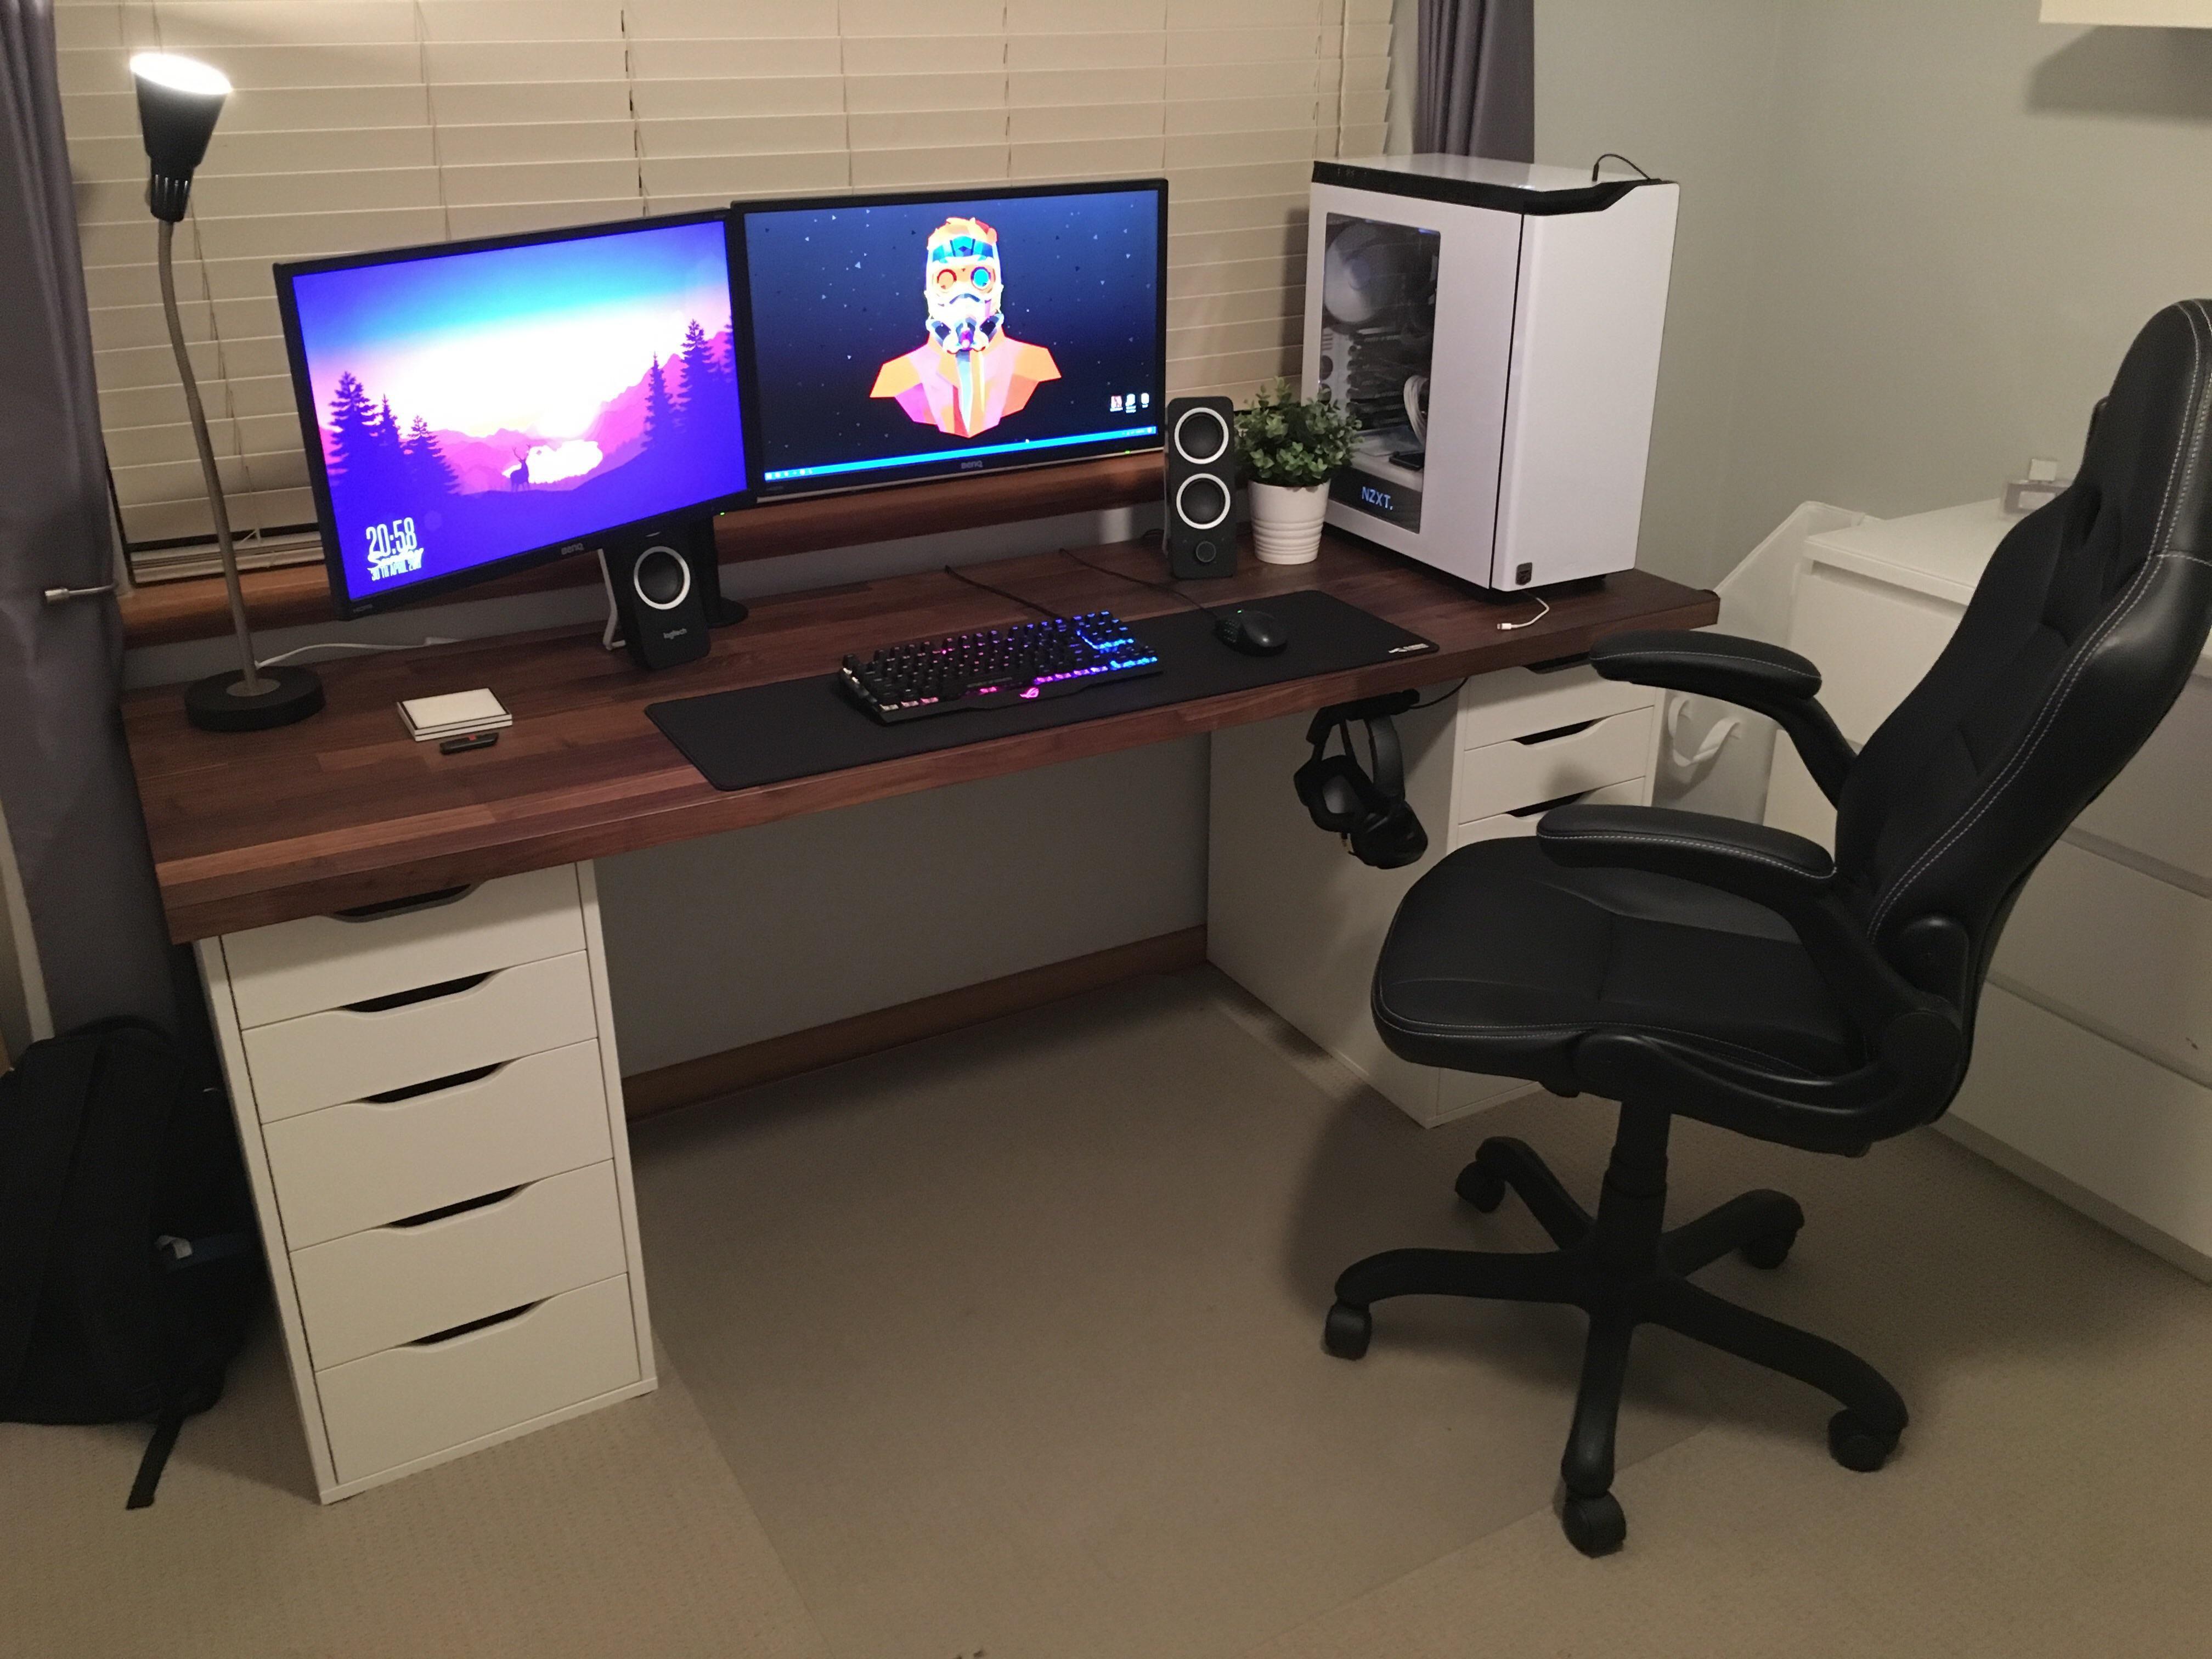 Generic IKEA Setup V2 bestgamesetupscom Pinterest Gaming